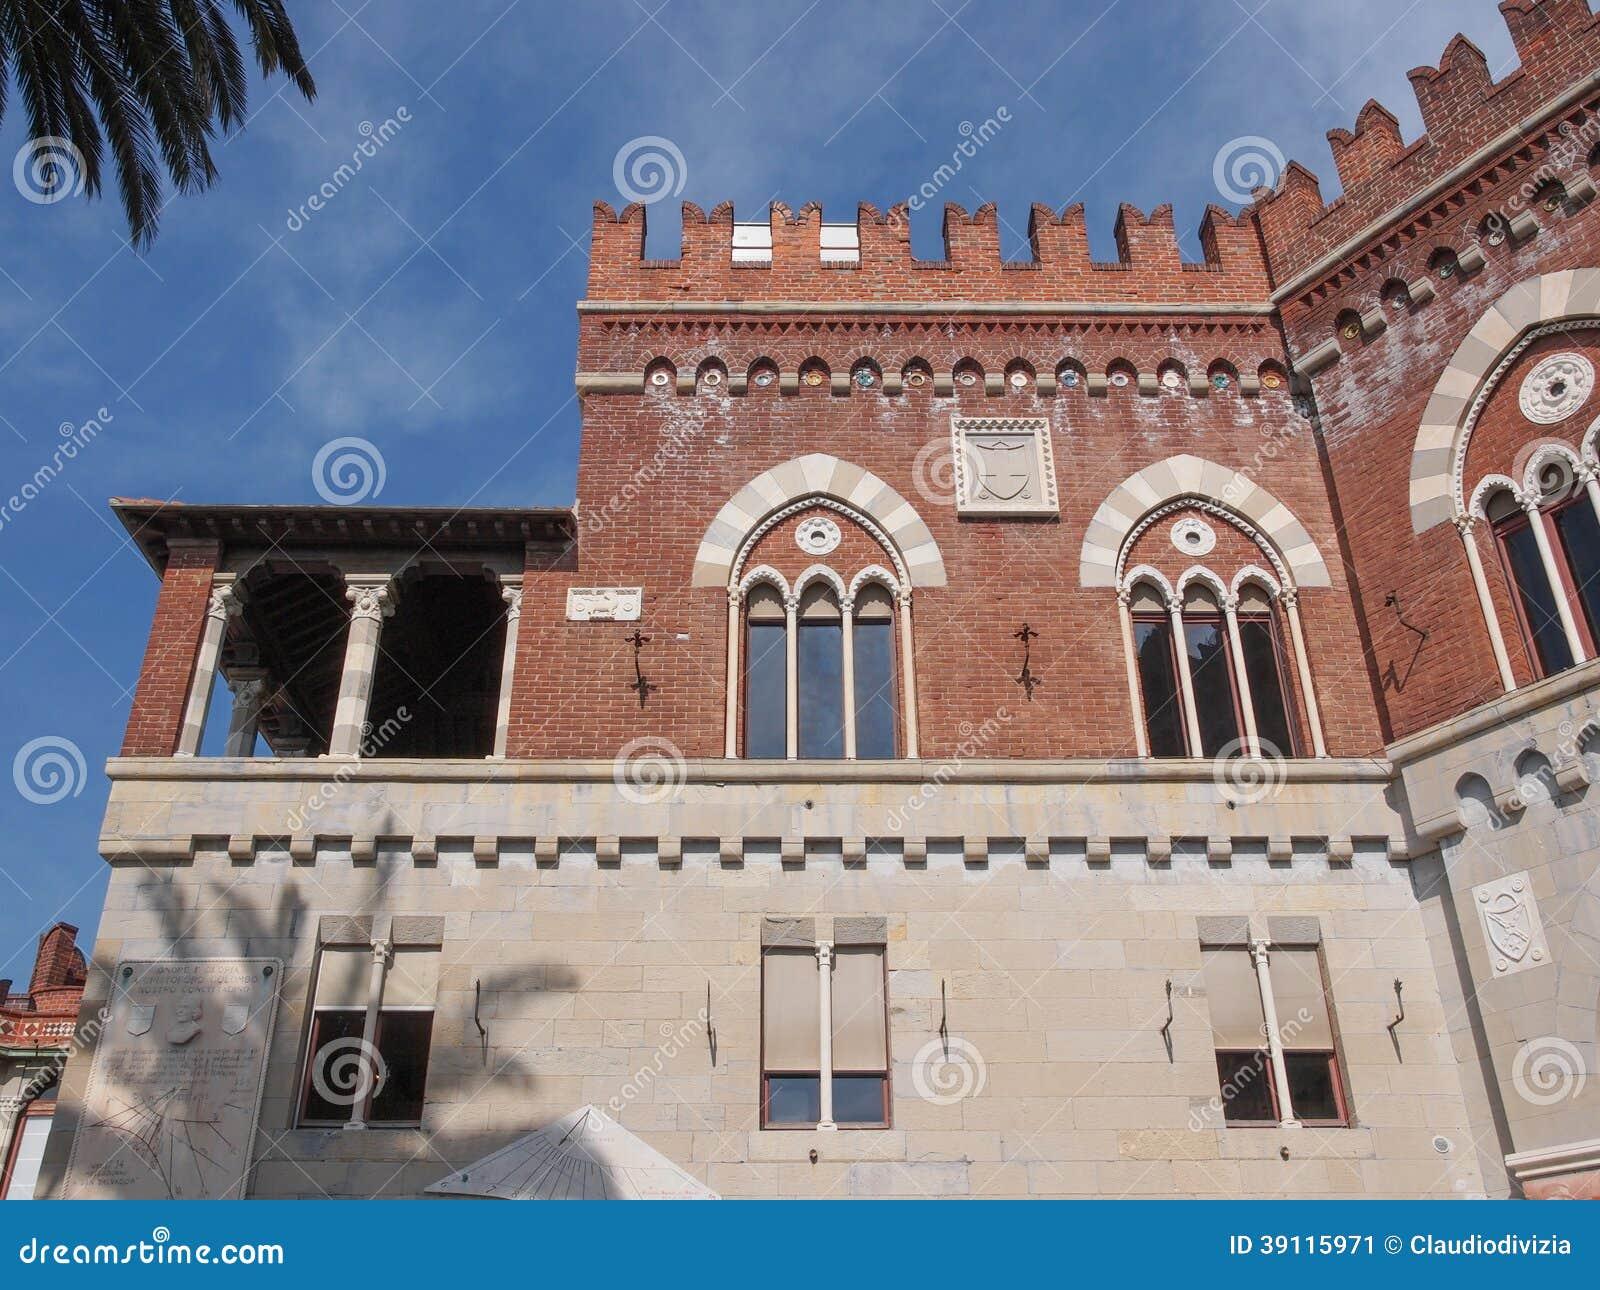 Albertiskasteel in Genoa Italy